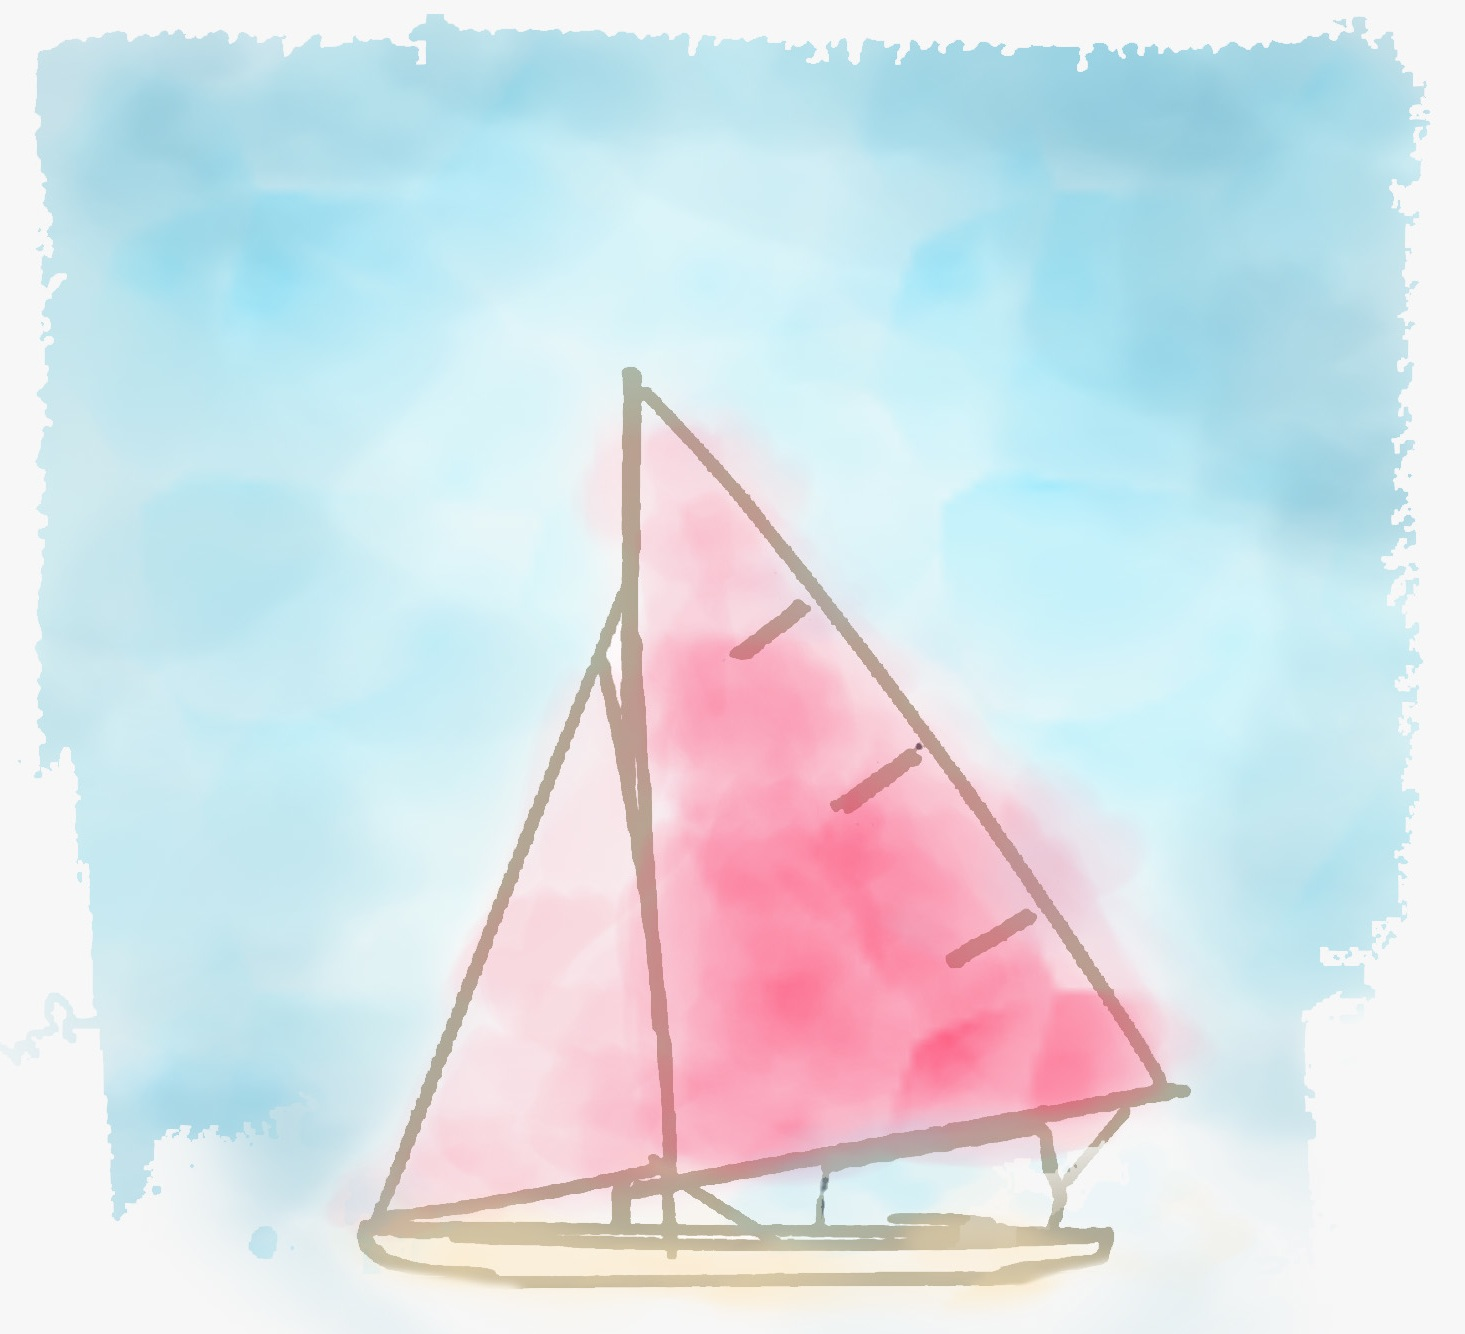 watercolor, sail boat